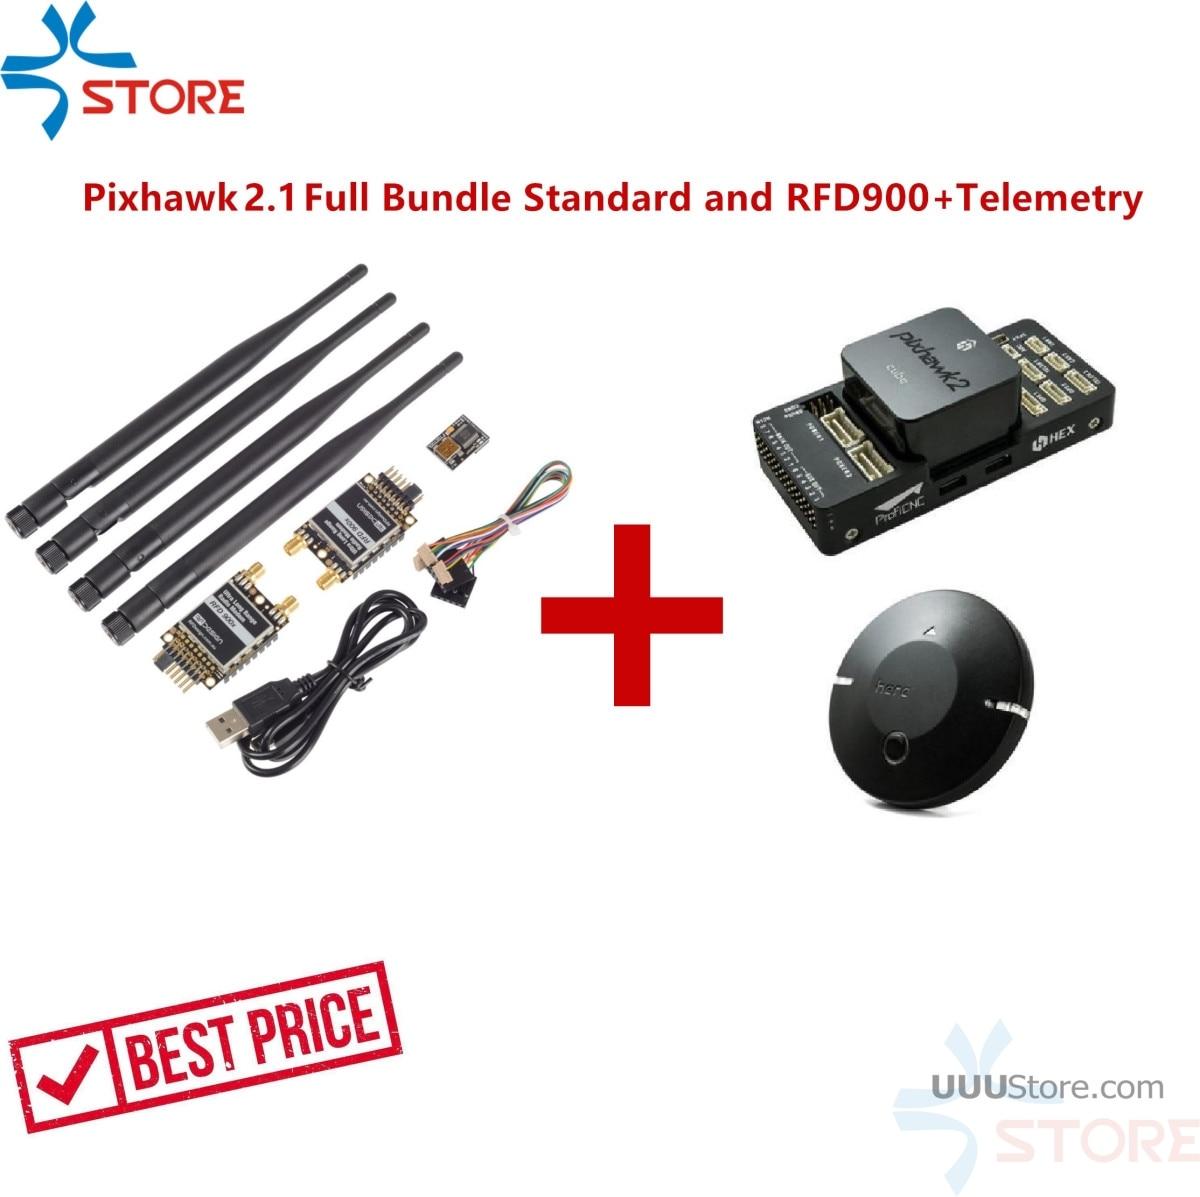 Hex Tecnologia Carrier Board RFD900 Pixhawk 2.1 Pacote Completo Padrão + Telemetria Combo